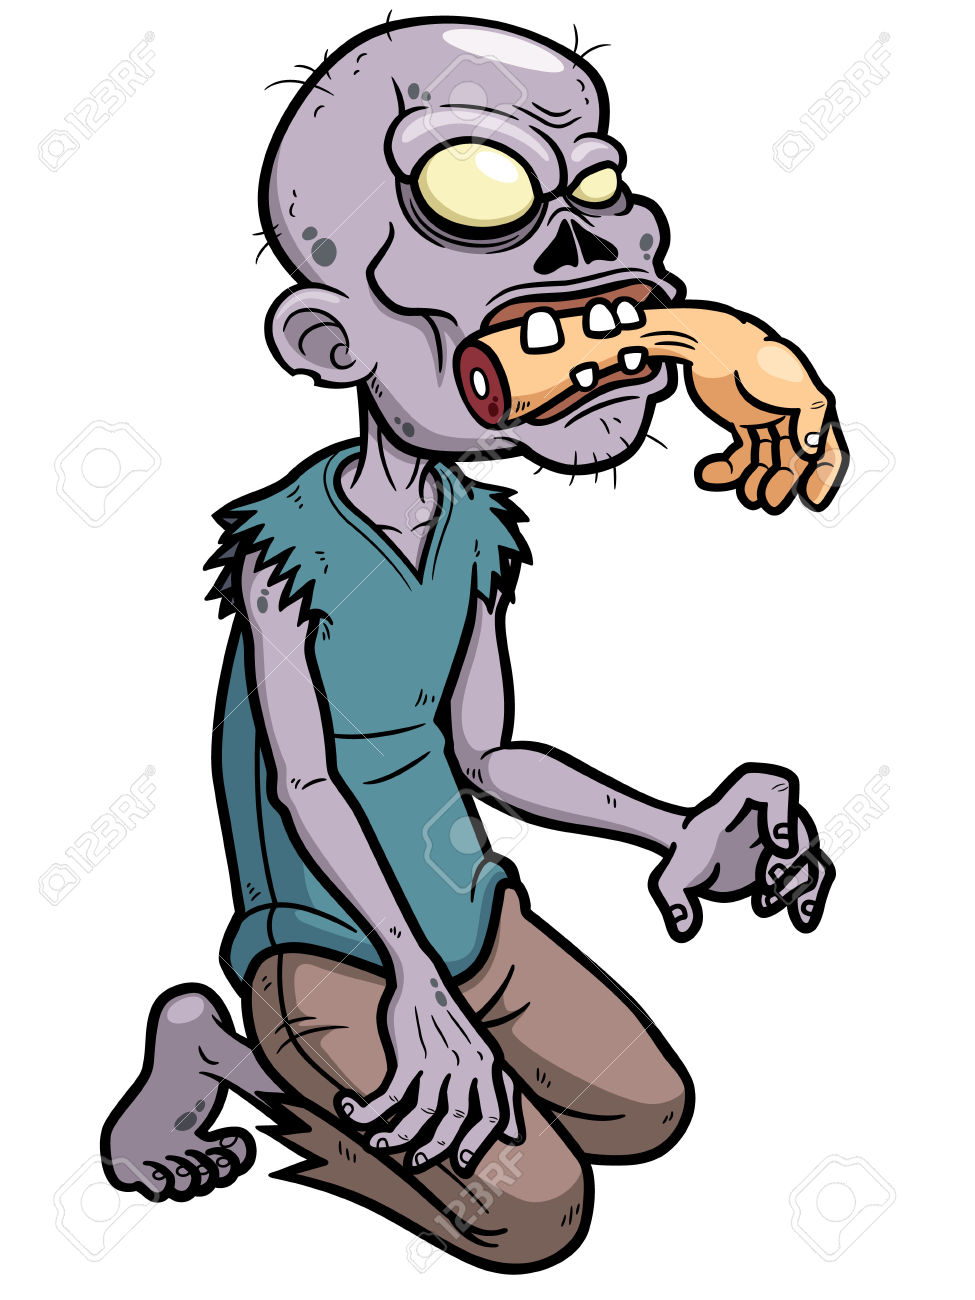 Zombie clipart halloween person. Cartoon free download best